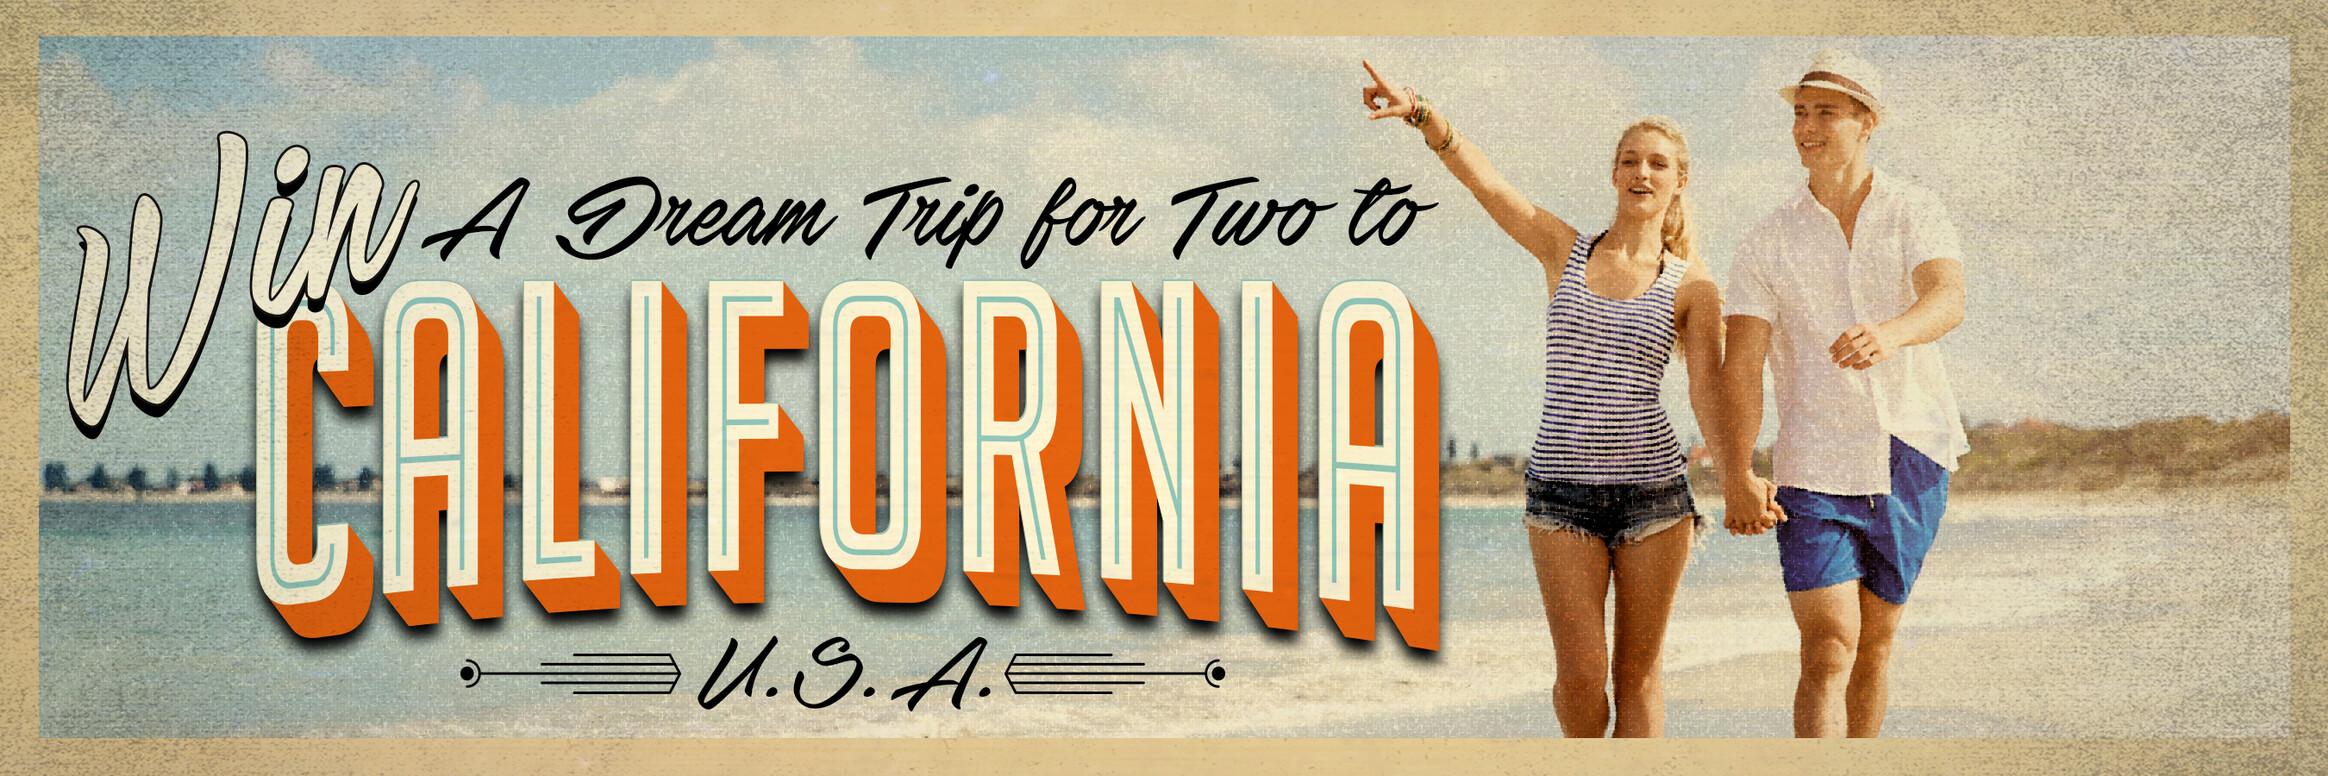 Win a dream trip to California